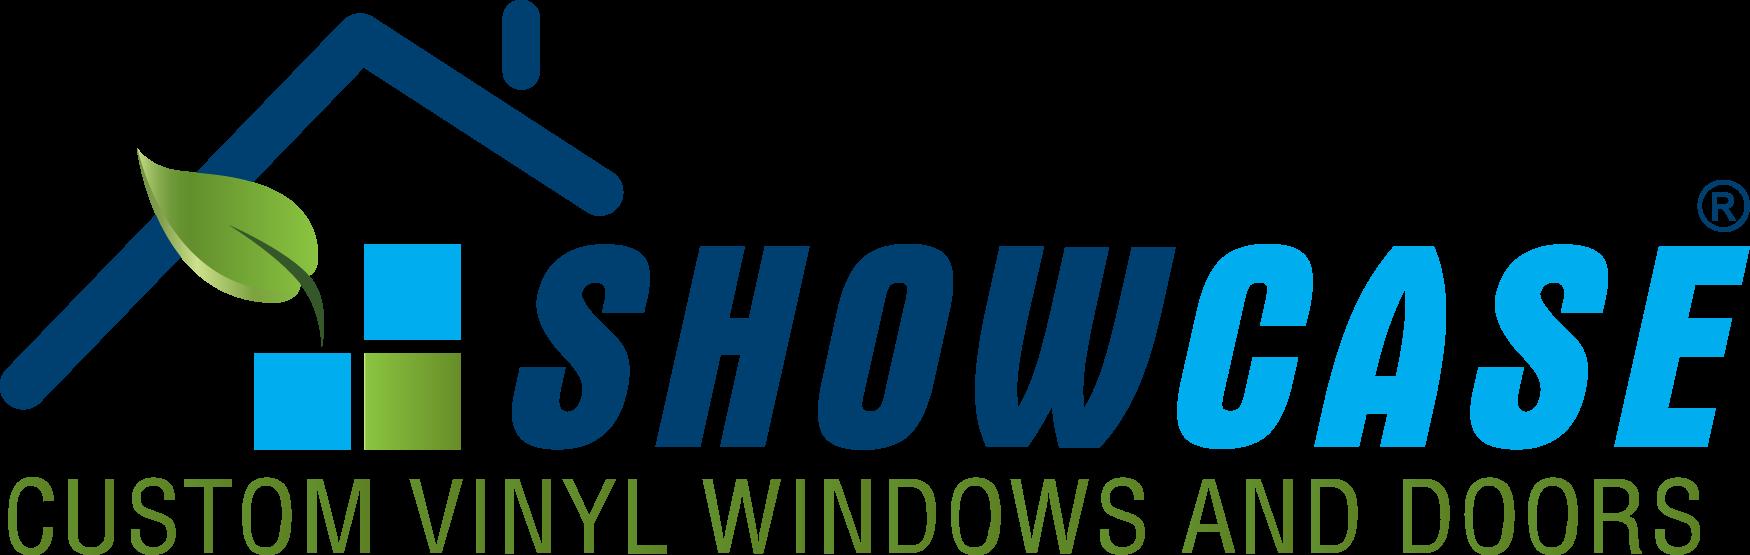 Showcase Windows